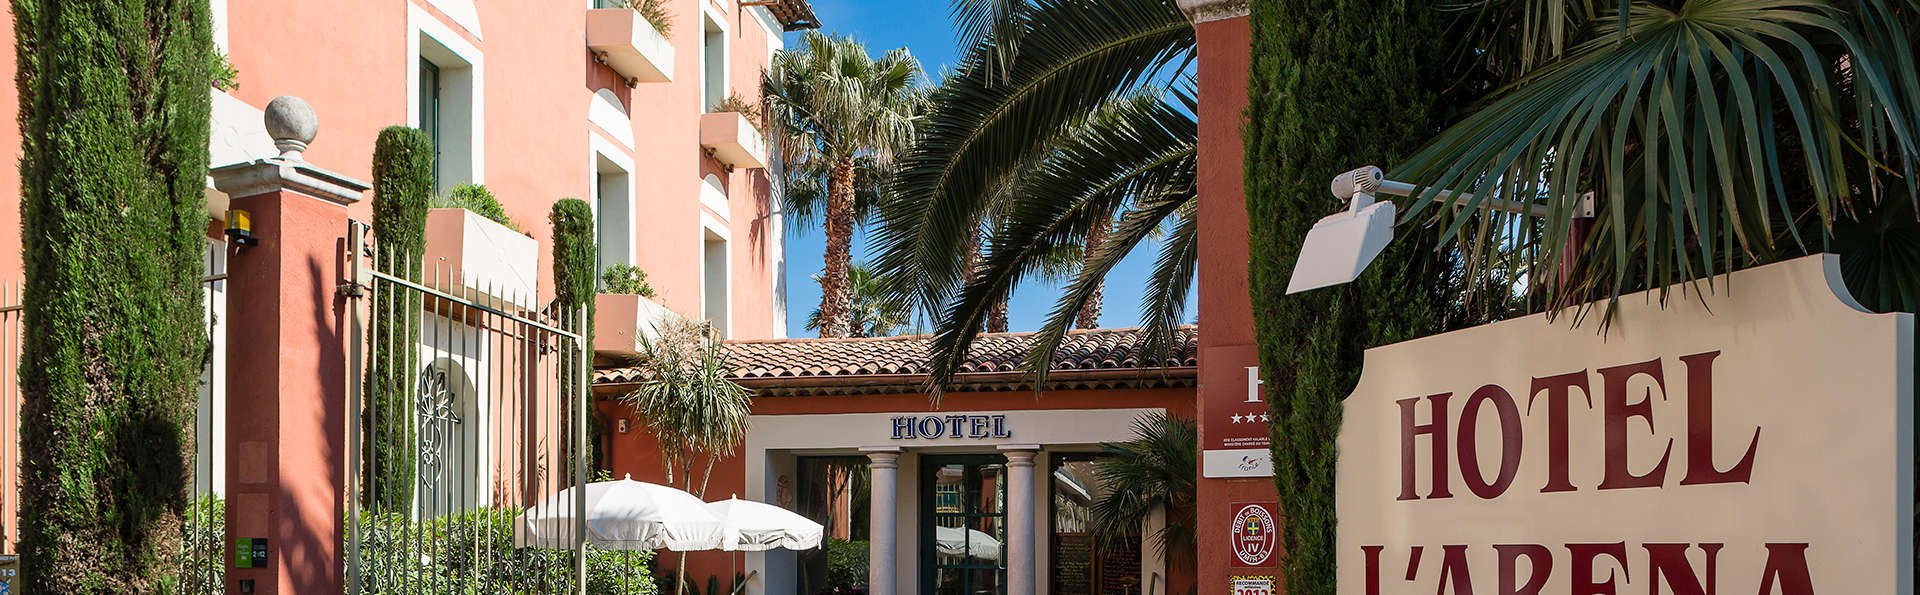 Hôtel l'Aréna - EDIT_front.jpg